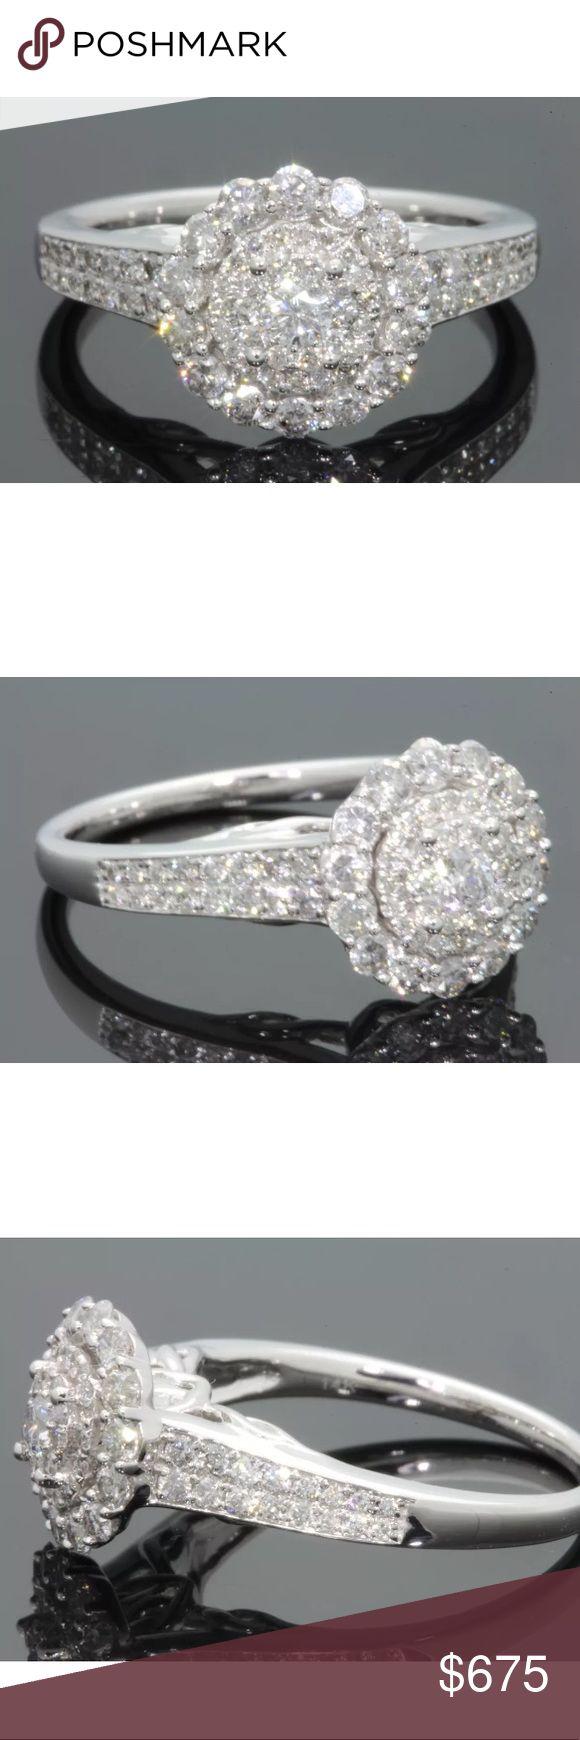 1.20 carat 14k white gold diamond ring 1.20 carat 14k white gold diamond ring! Beautiful round H-I color/SI2 clarity diamonds! Retail $2000! Lower on pal! Jewelry Rings